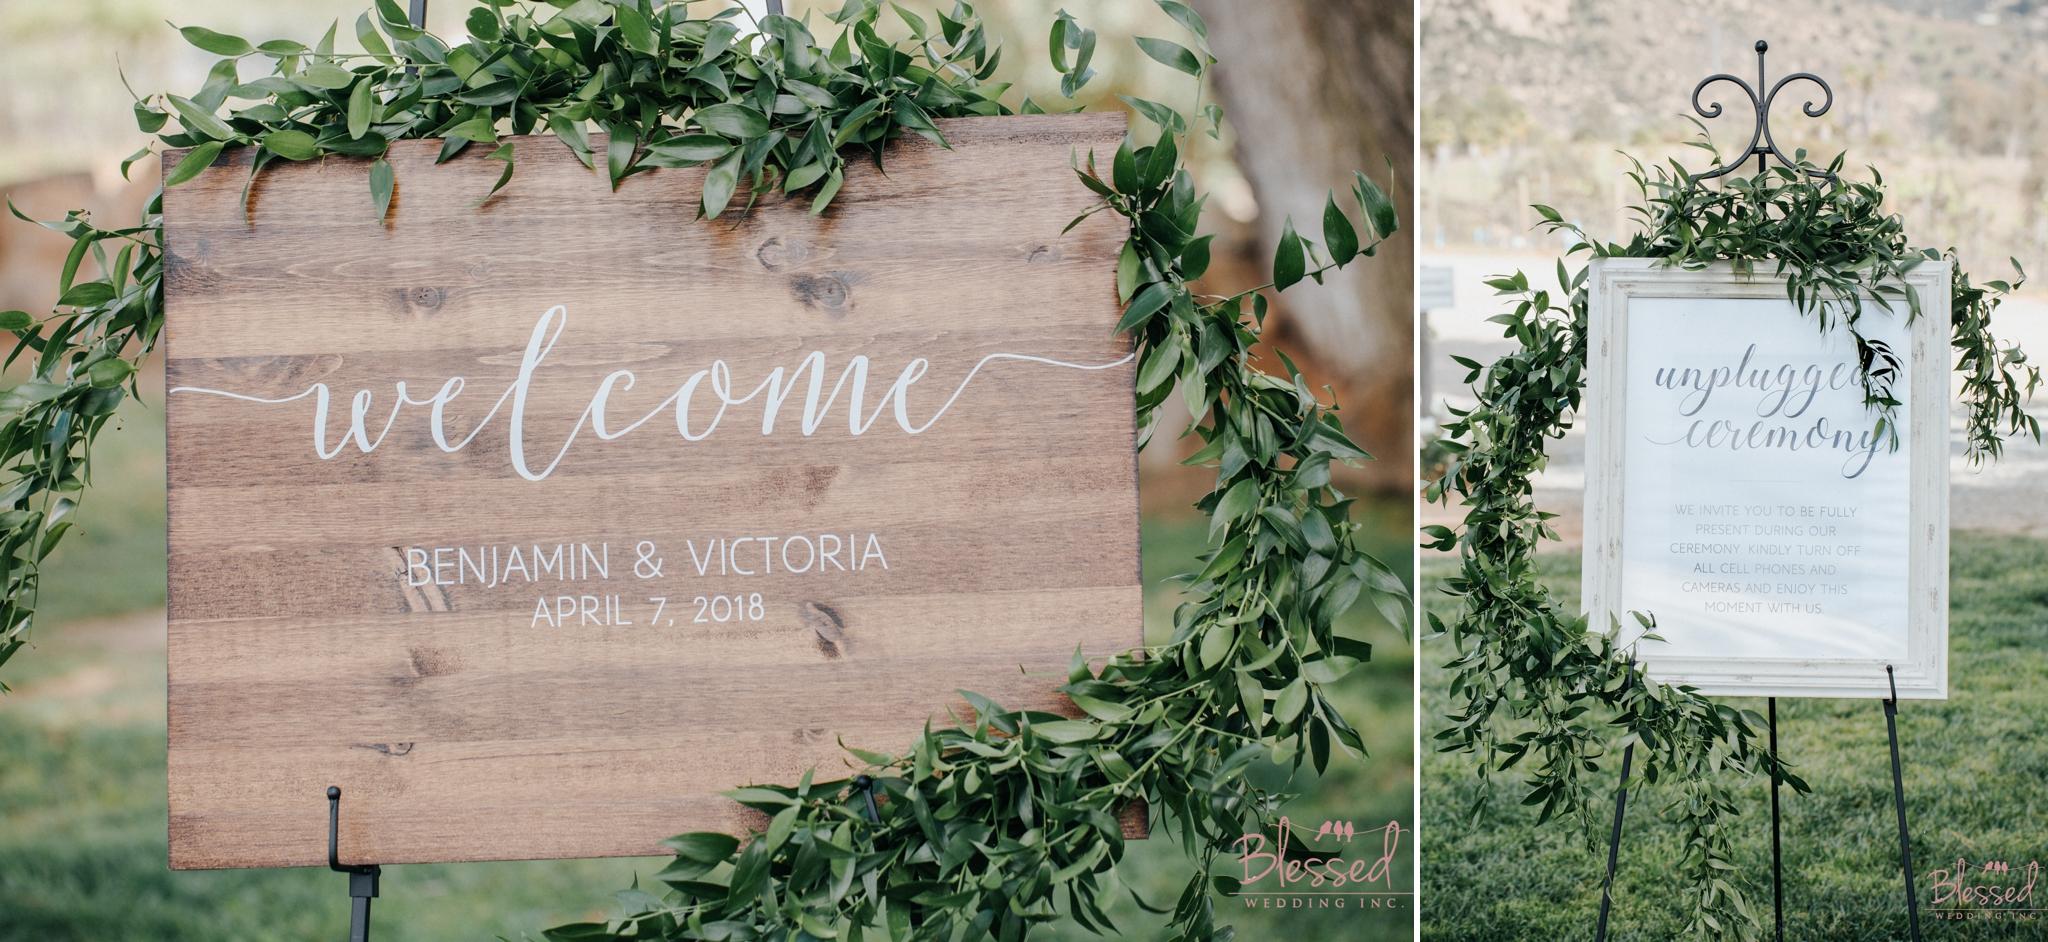 Orfila Vinery Wedding by Blessed Wedding Photography 37.jpg